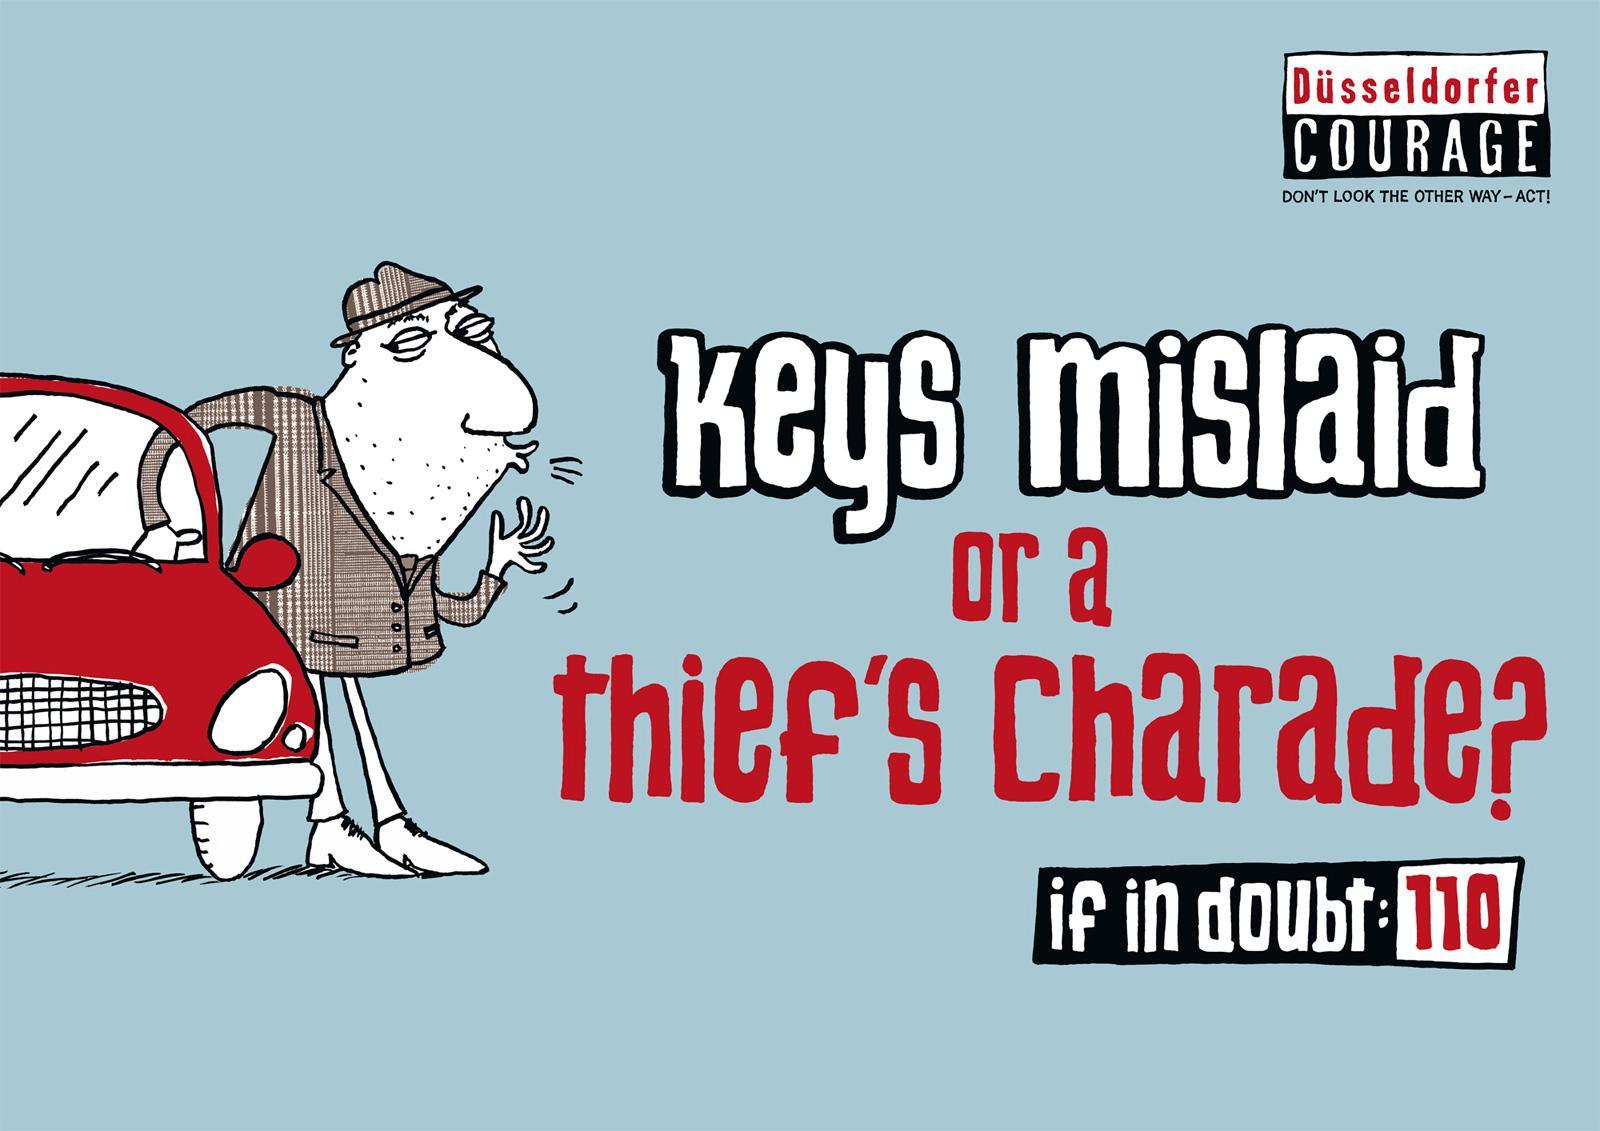 Duesseldorfer Courage Print Ad -  Keys mislaid